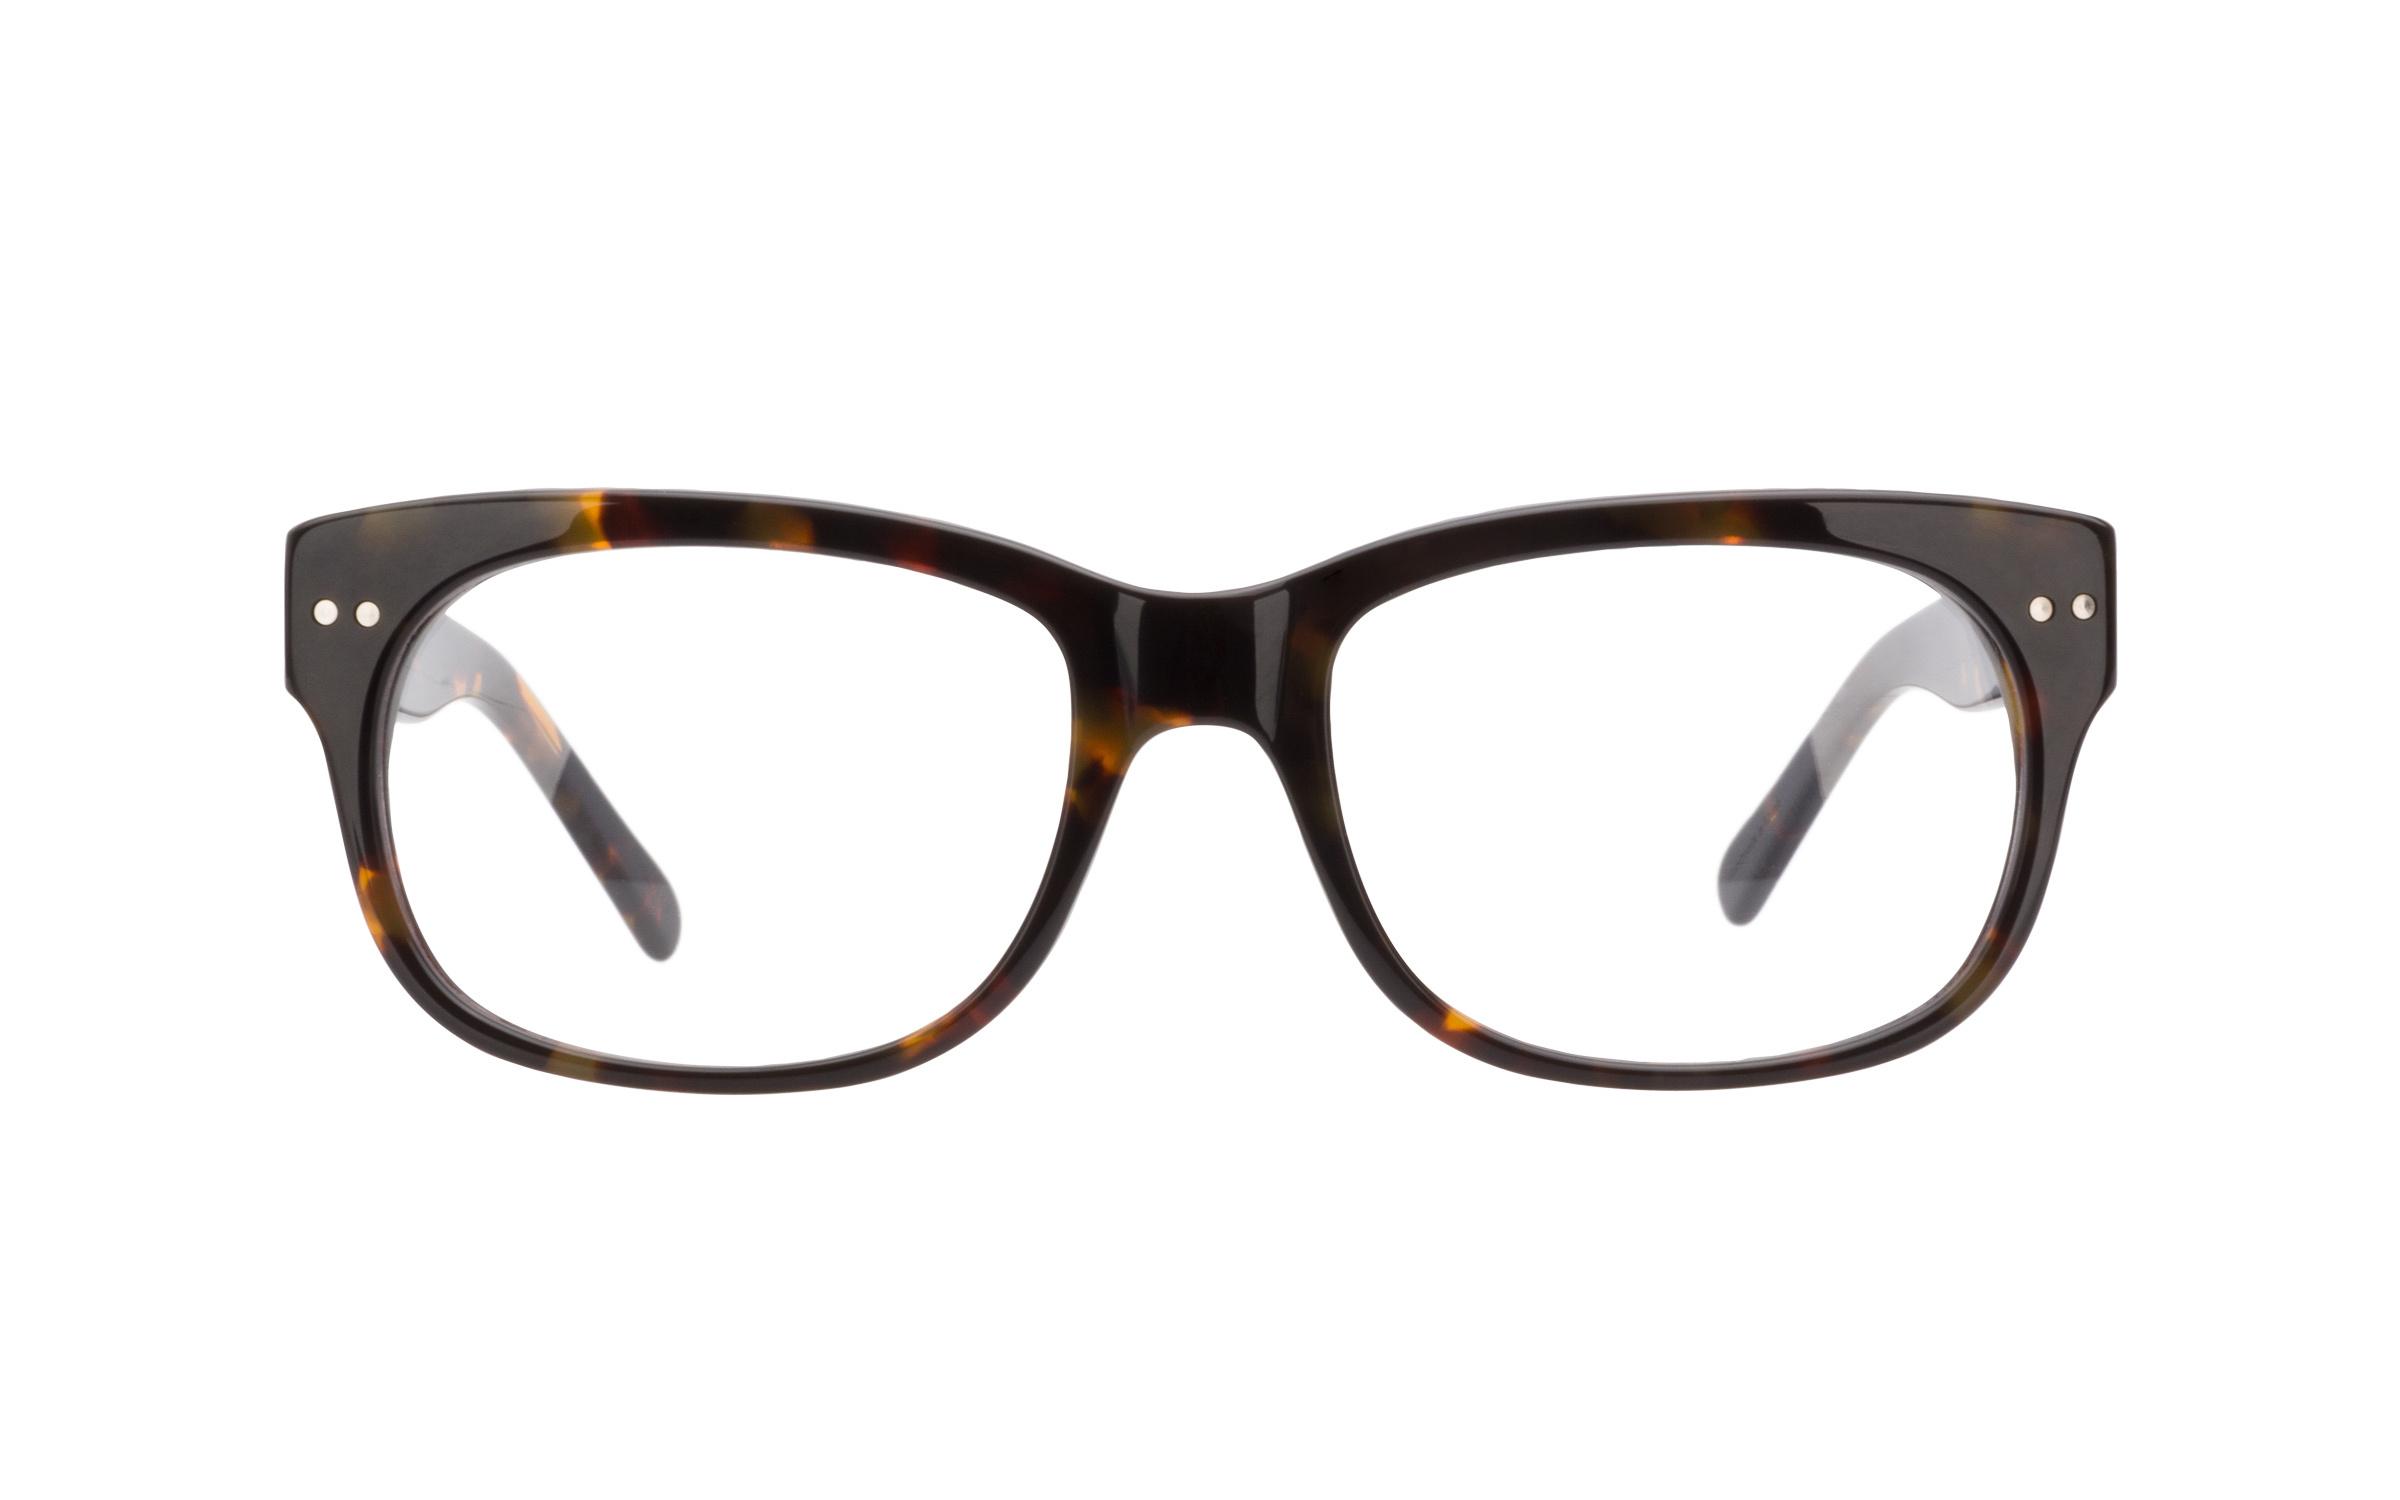 Vintage eyeglass frames | Compare Prices at Nextag